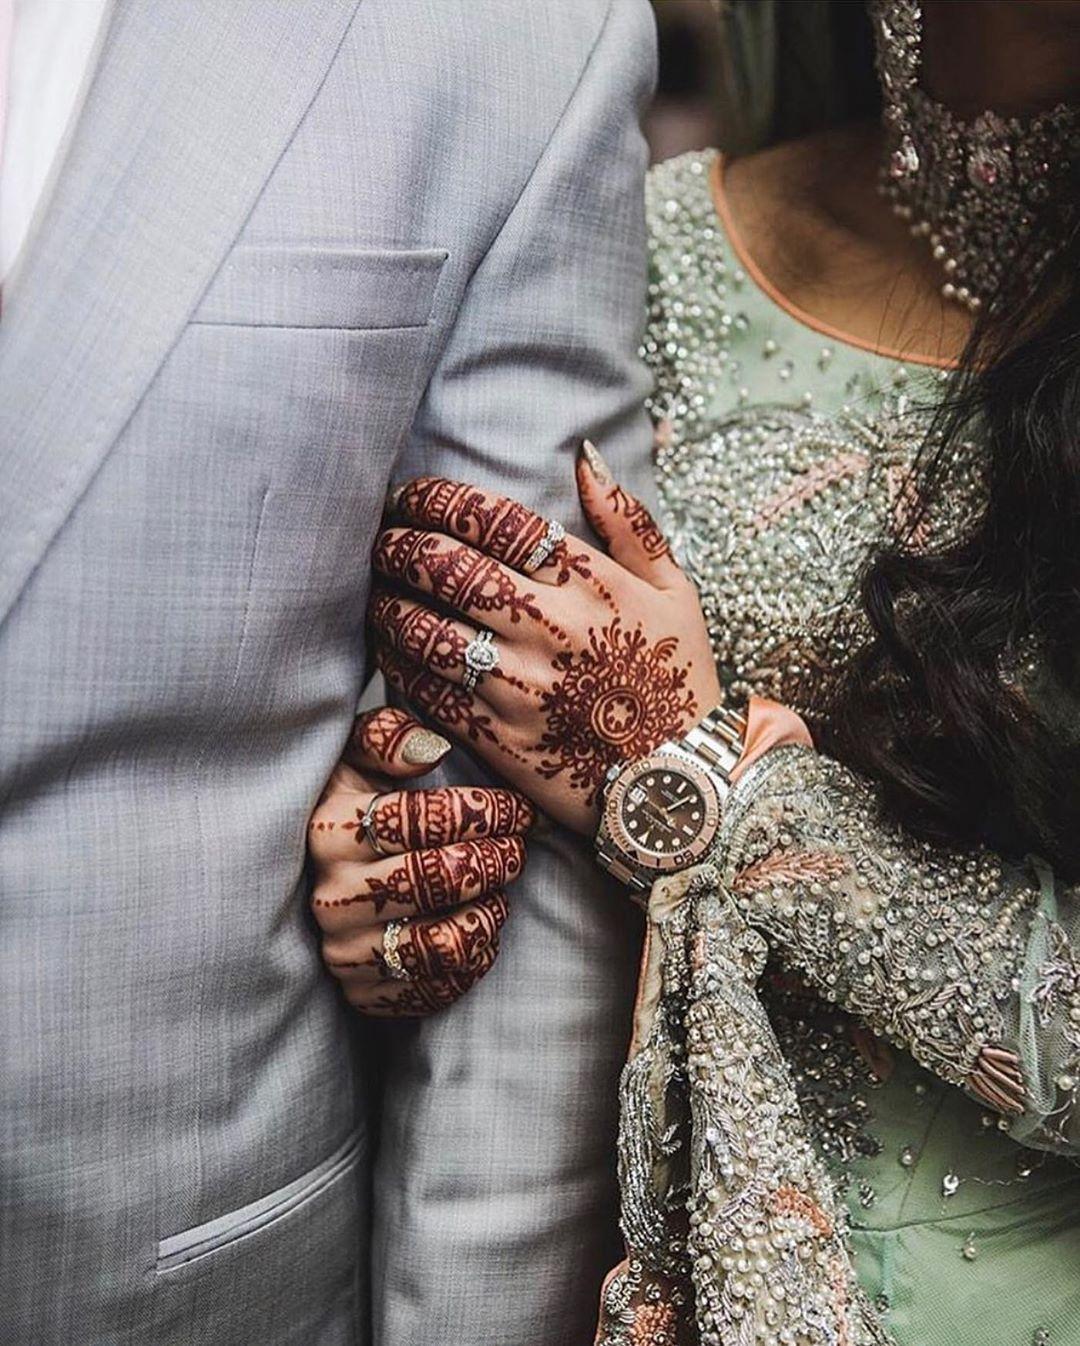 "Pakistani Bride on Instagram: ""Perfect ❤️ 📸: @sumirasji ✨ #pakistanibride #weddinghenna #hennastain #mehndistain #mehendistain #bridaldiaries #weddingdiaries…"""